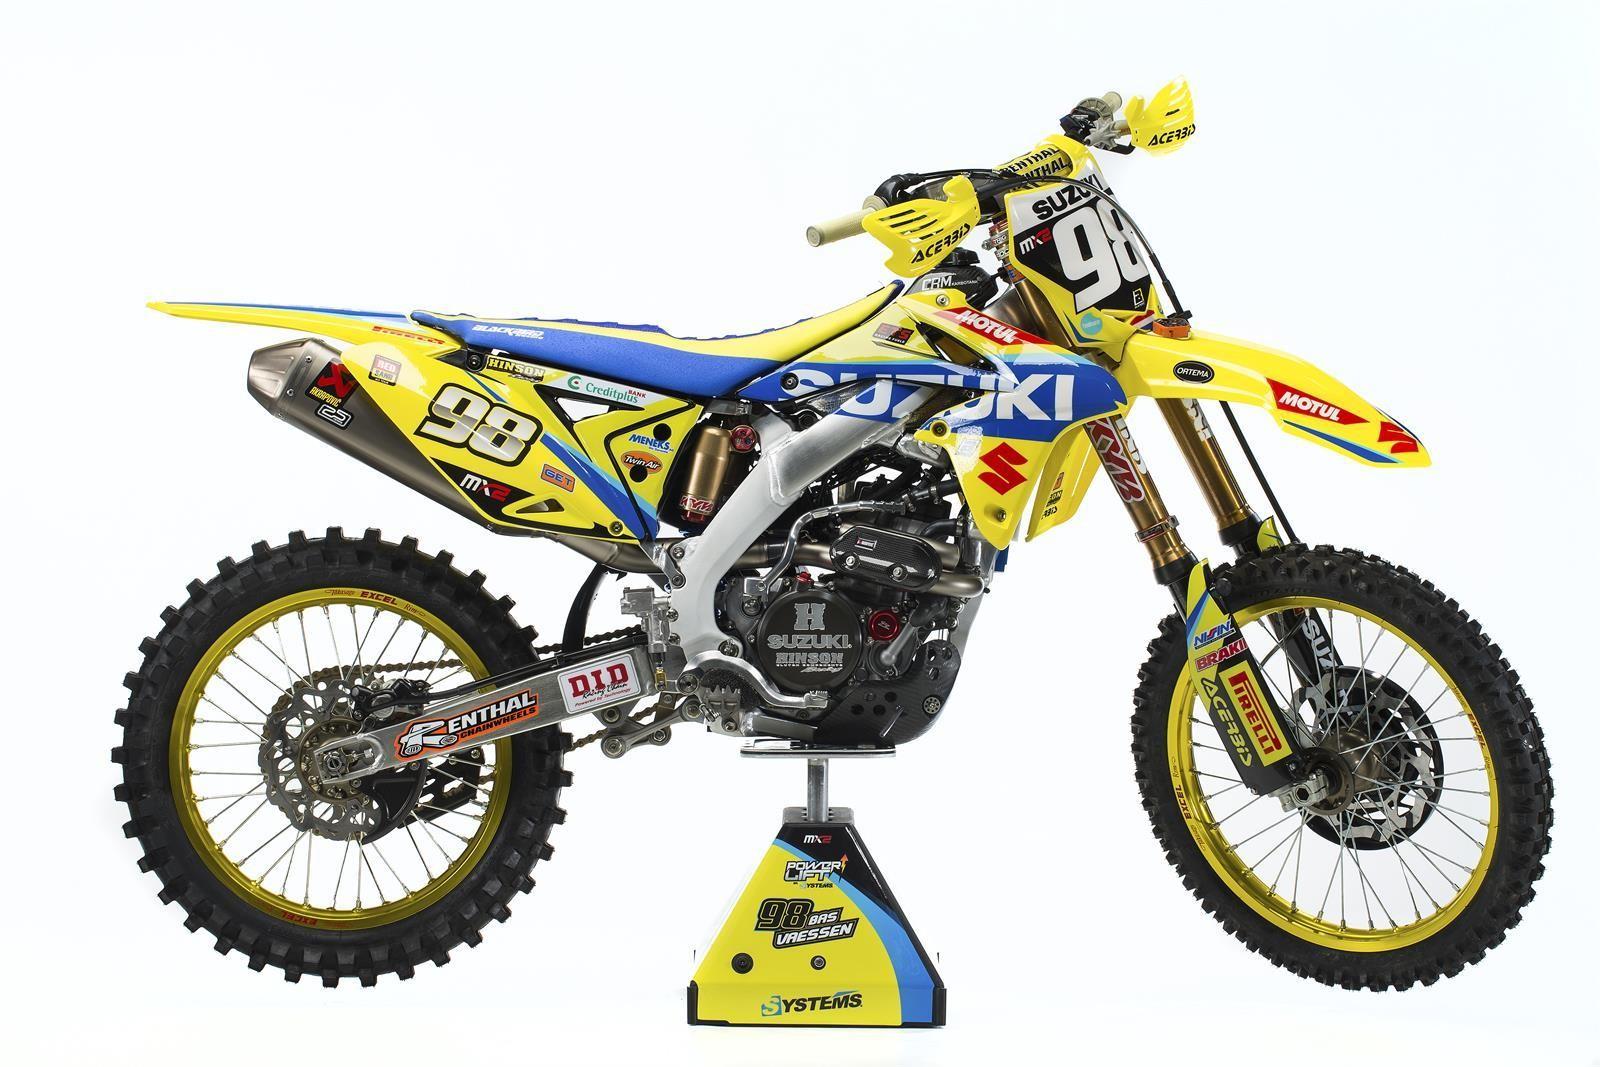 Bas Vaessen's 2017 Suzuki World MX2 RM-Z250 - First Look: 2017 Suzuki World MX2 Team - Motocross Pictures - Vital MX